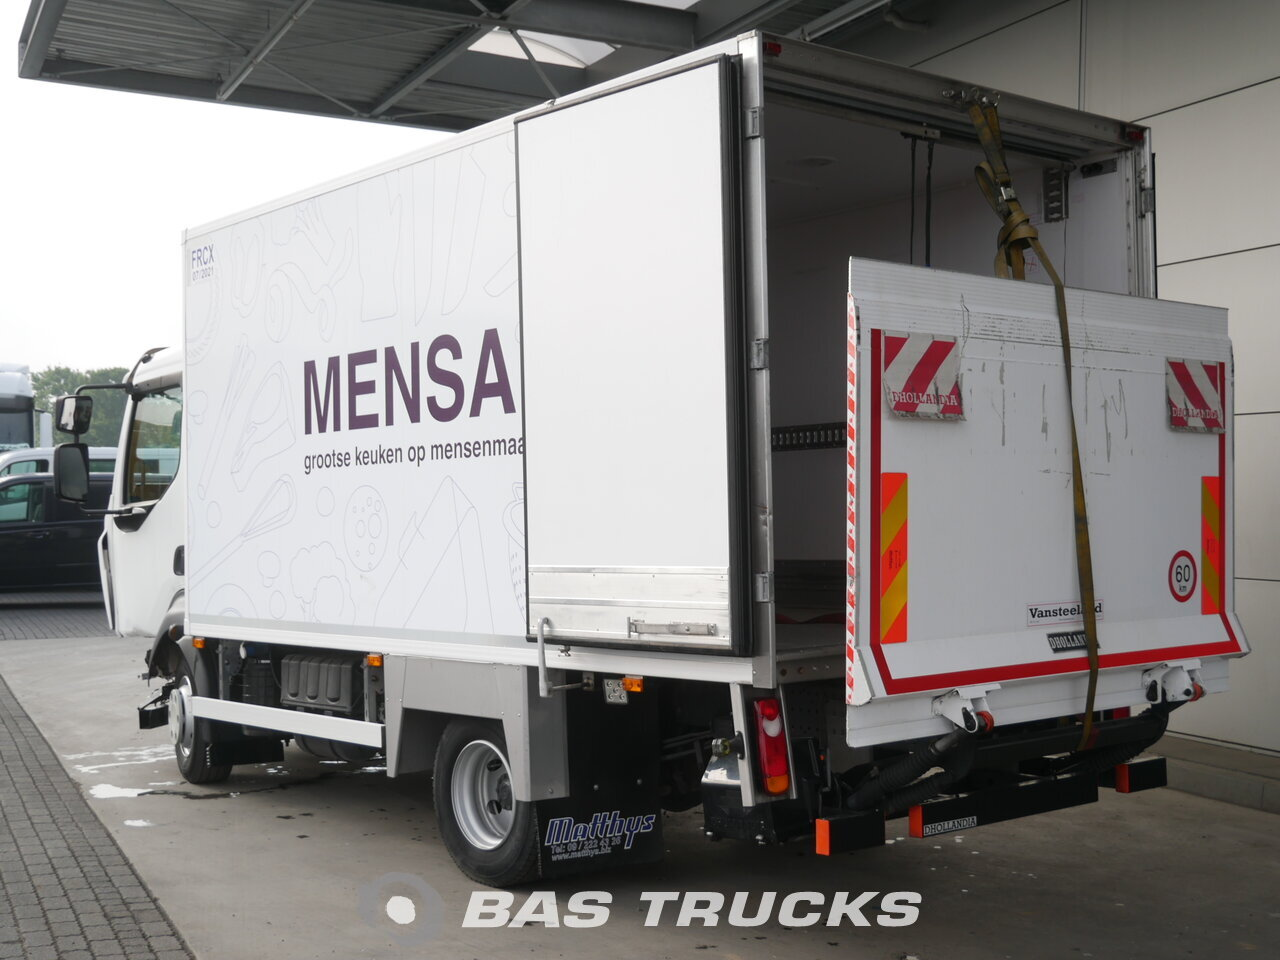 For sale at BAS Trucks: Renault D10 Unfall Fahrbahr 4X2 10/2015